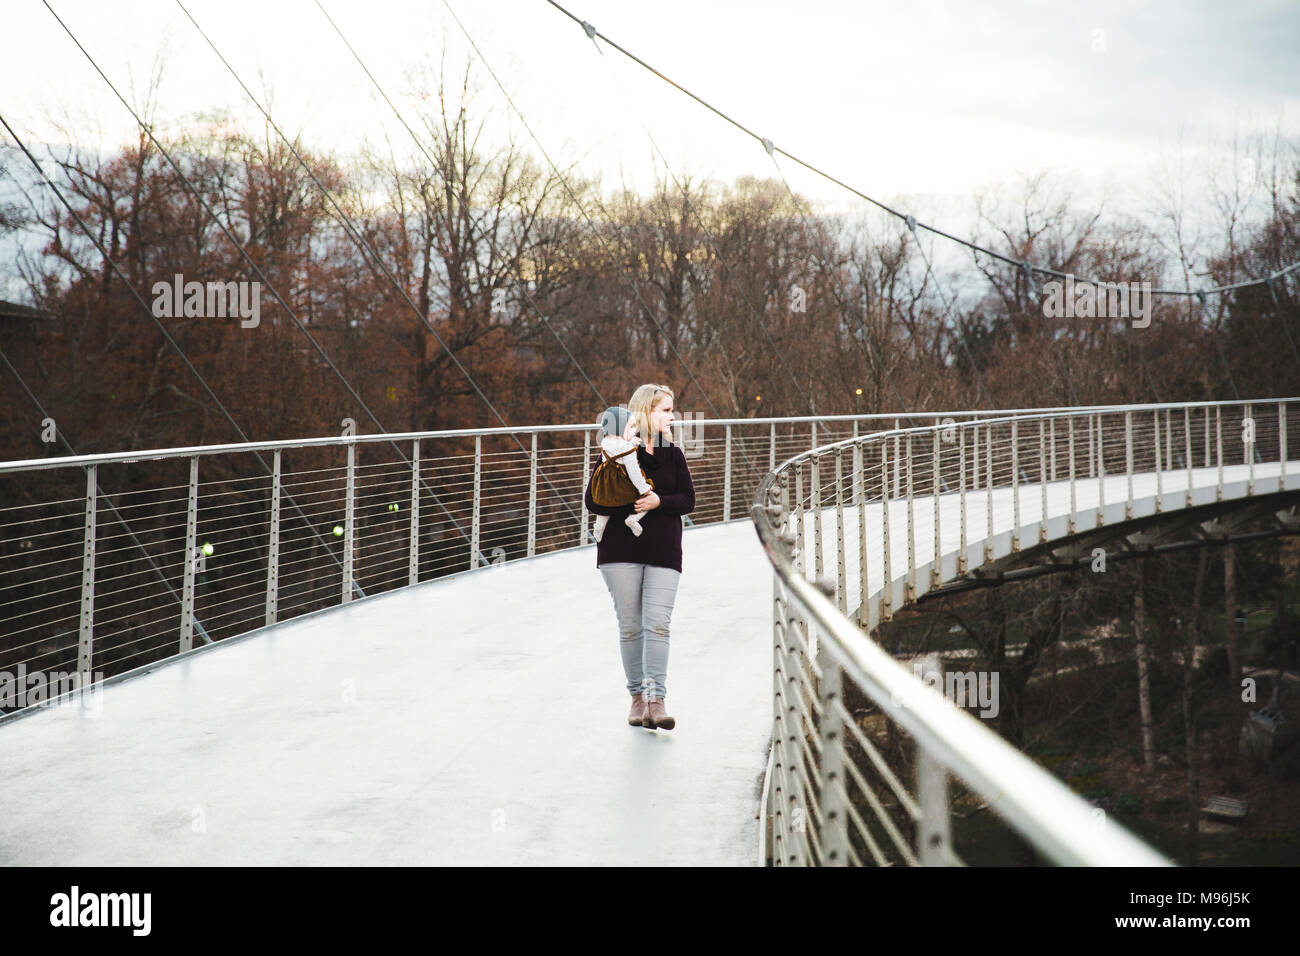 Woman holding child on a metal bridge - Stock Image